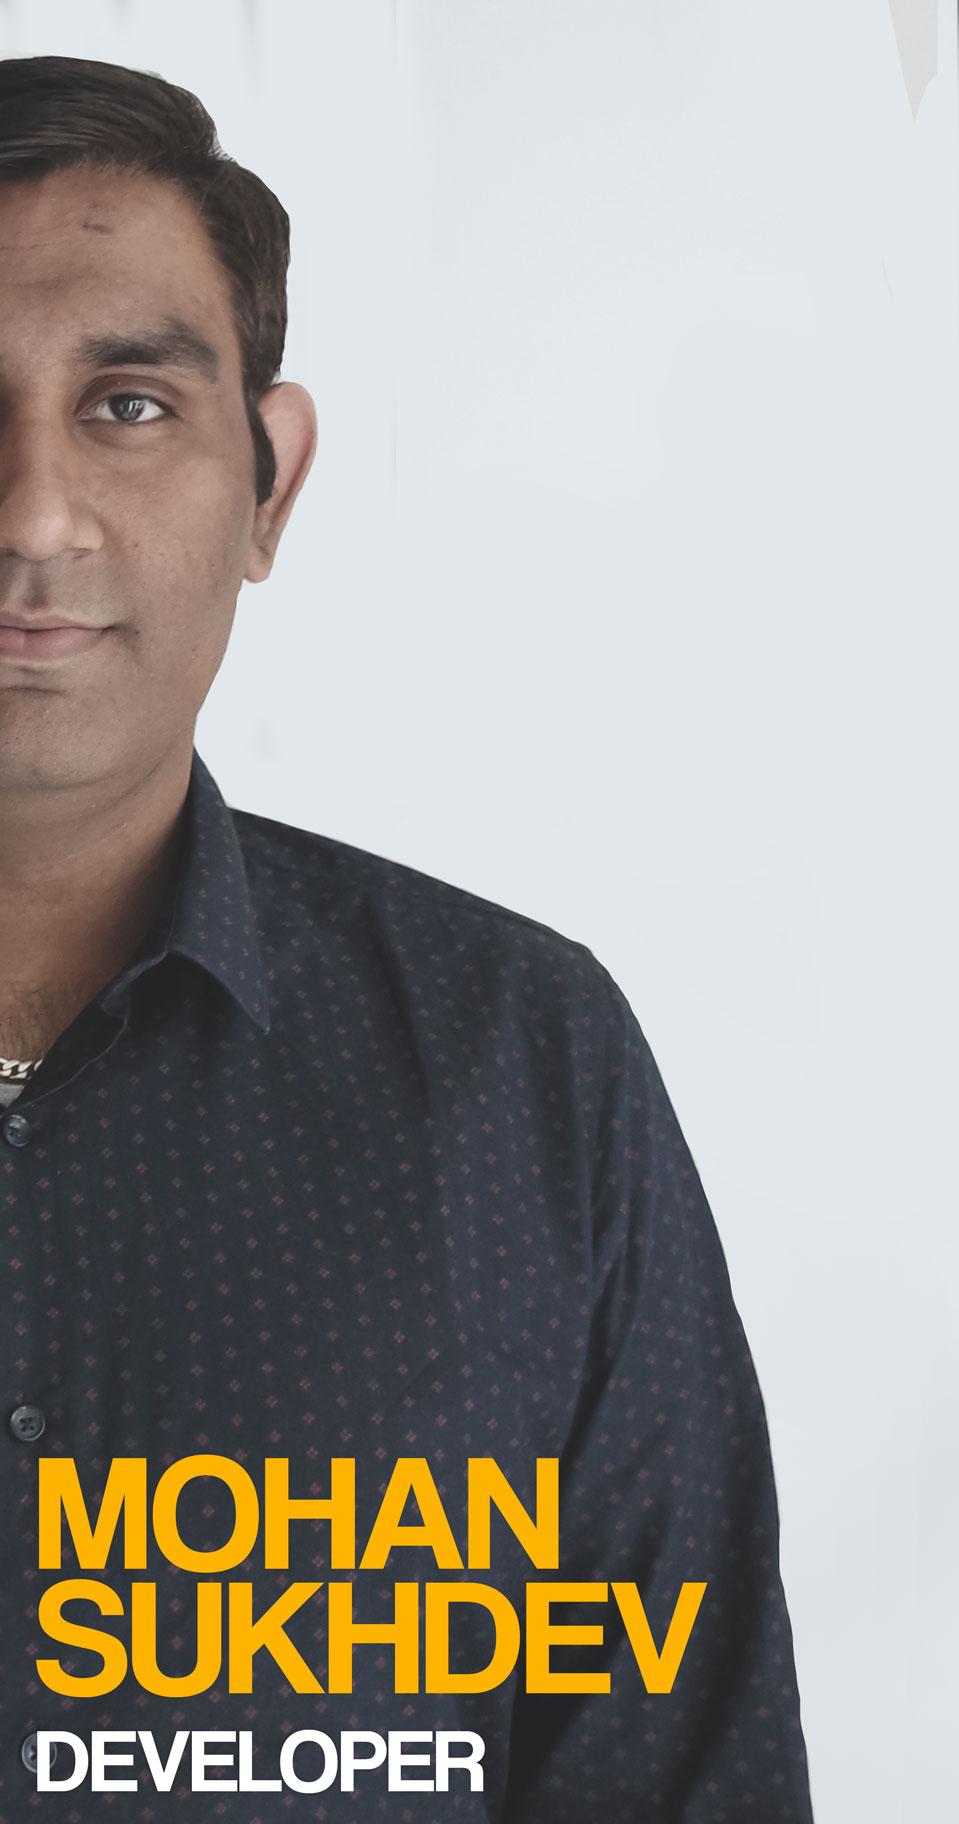 Sukhdev Mohan